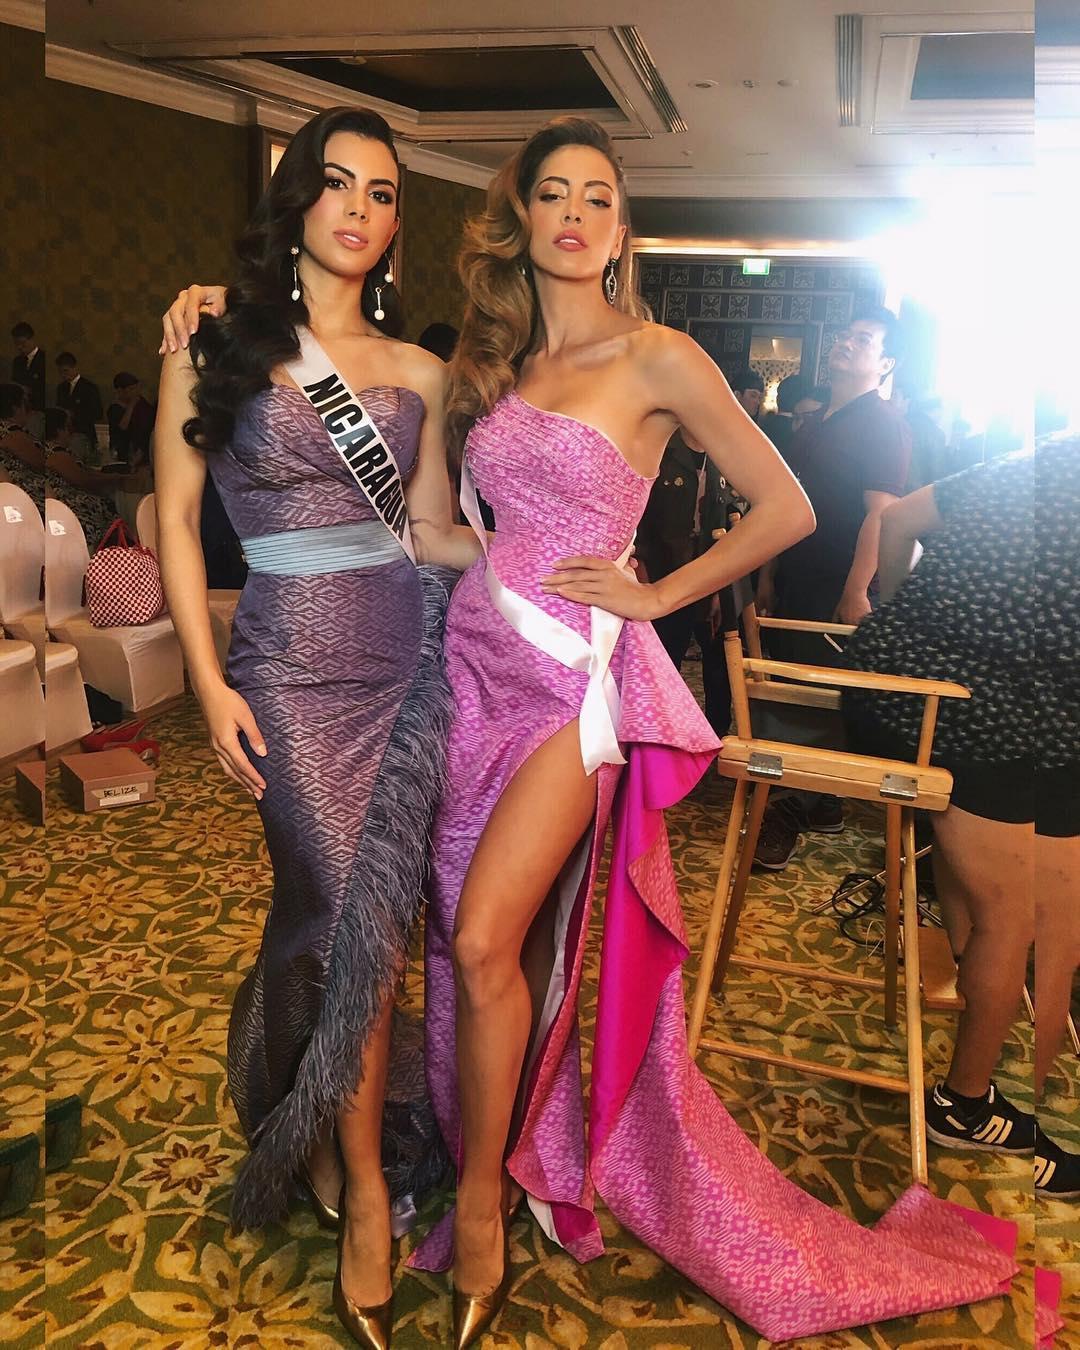 thai night gala dinner de candidatas a miss universe 2018. - Página 9 Ekf5kv6g